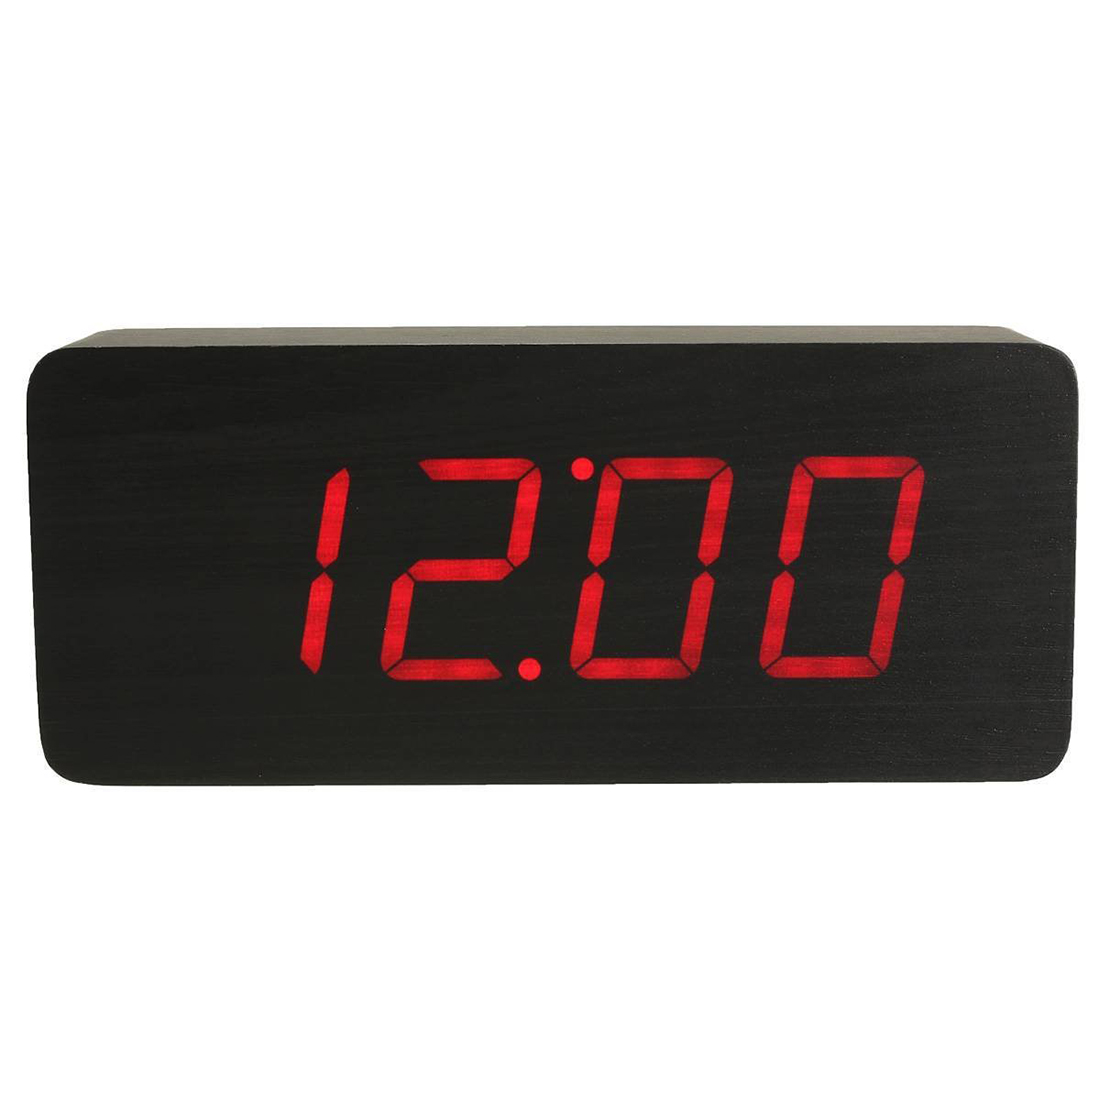 HOT-Acrylic Mirror Wood Digital LED Alarm Clock - Time, Calendar and Temperature